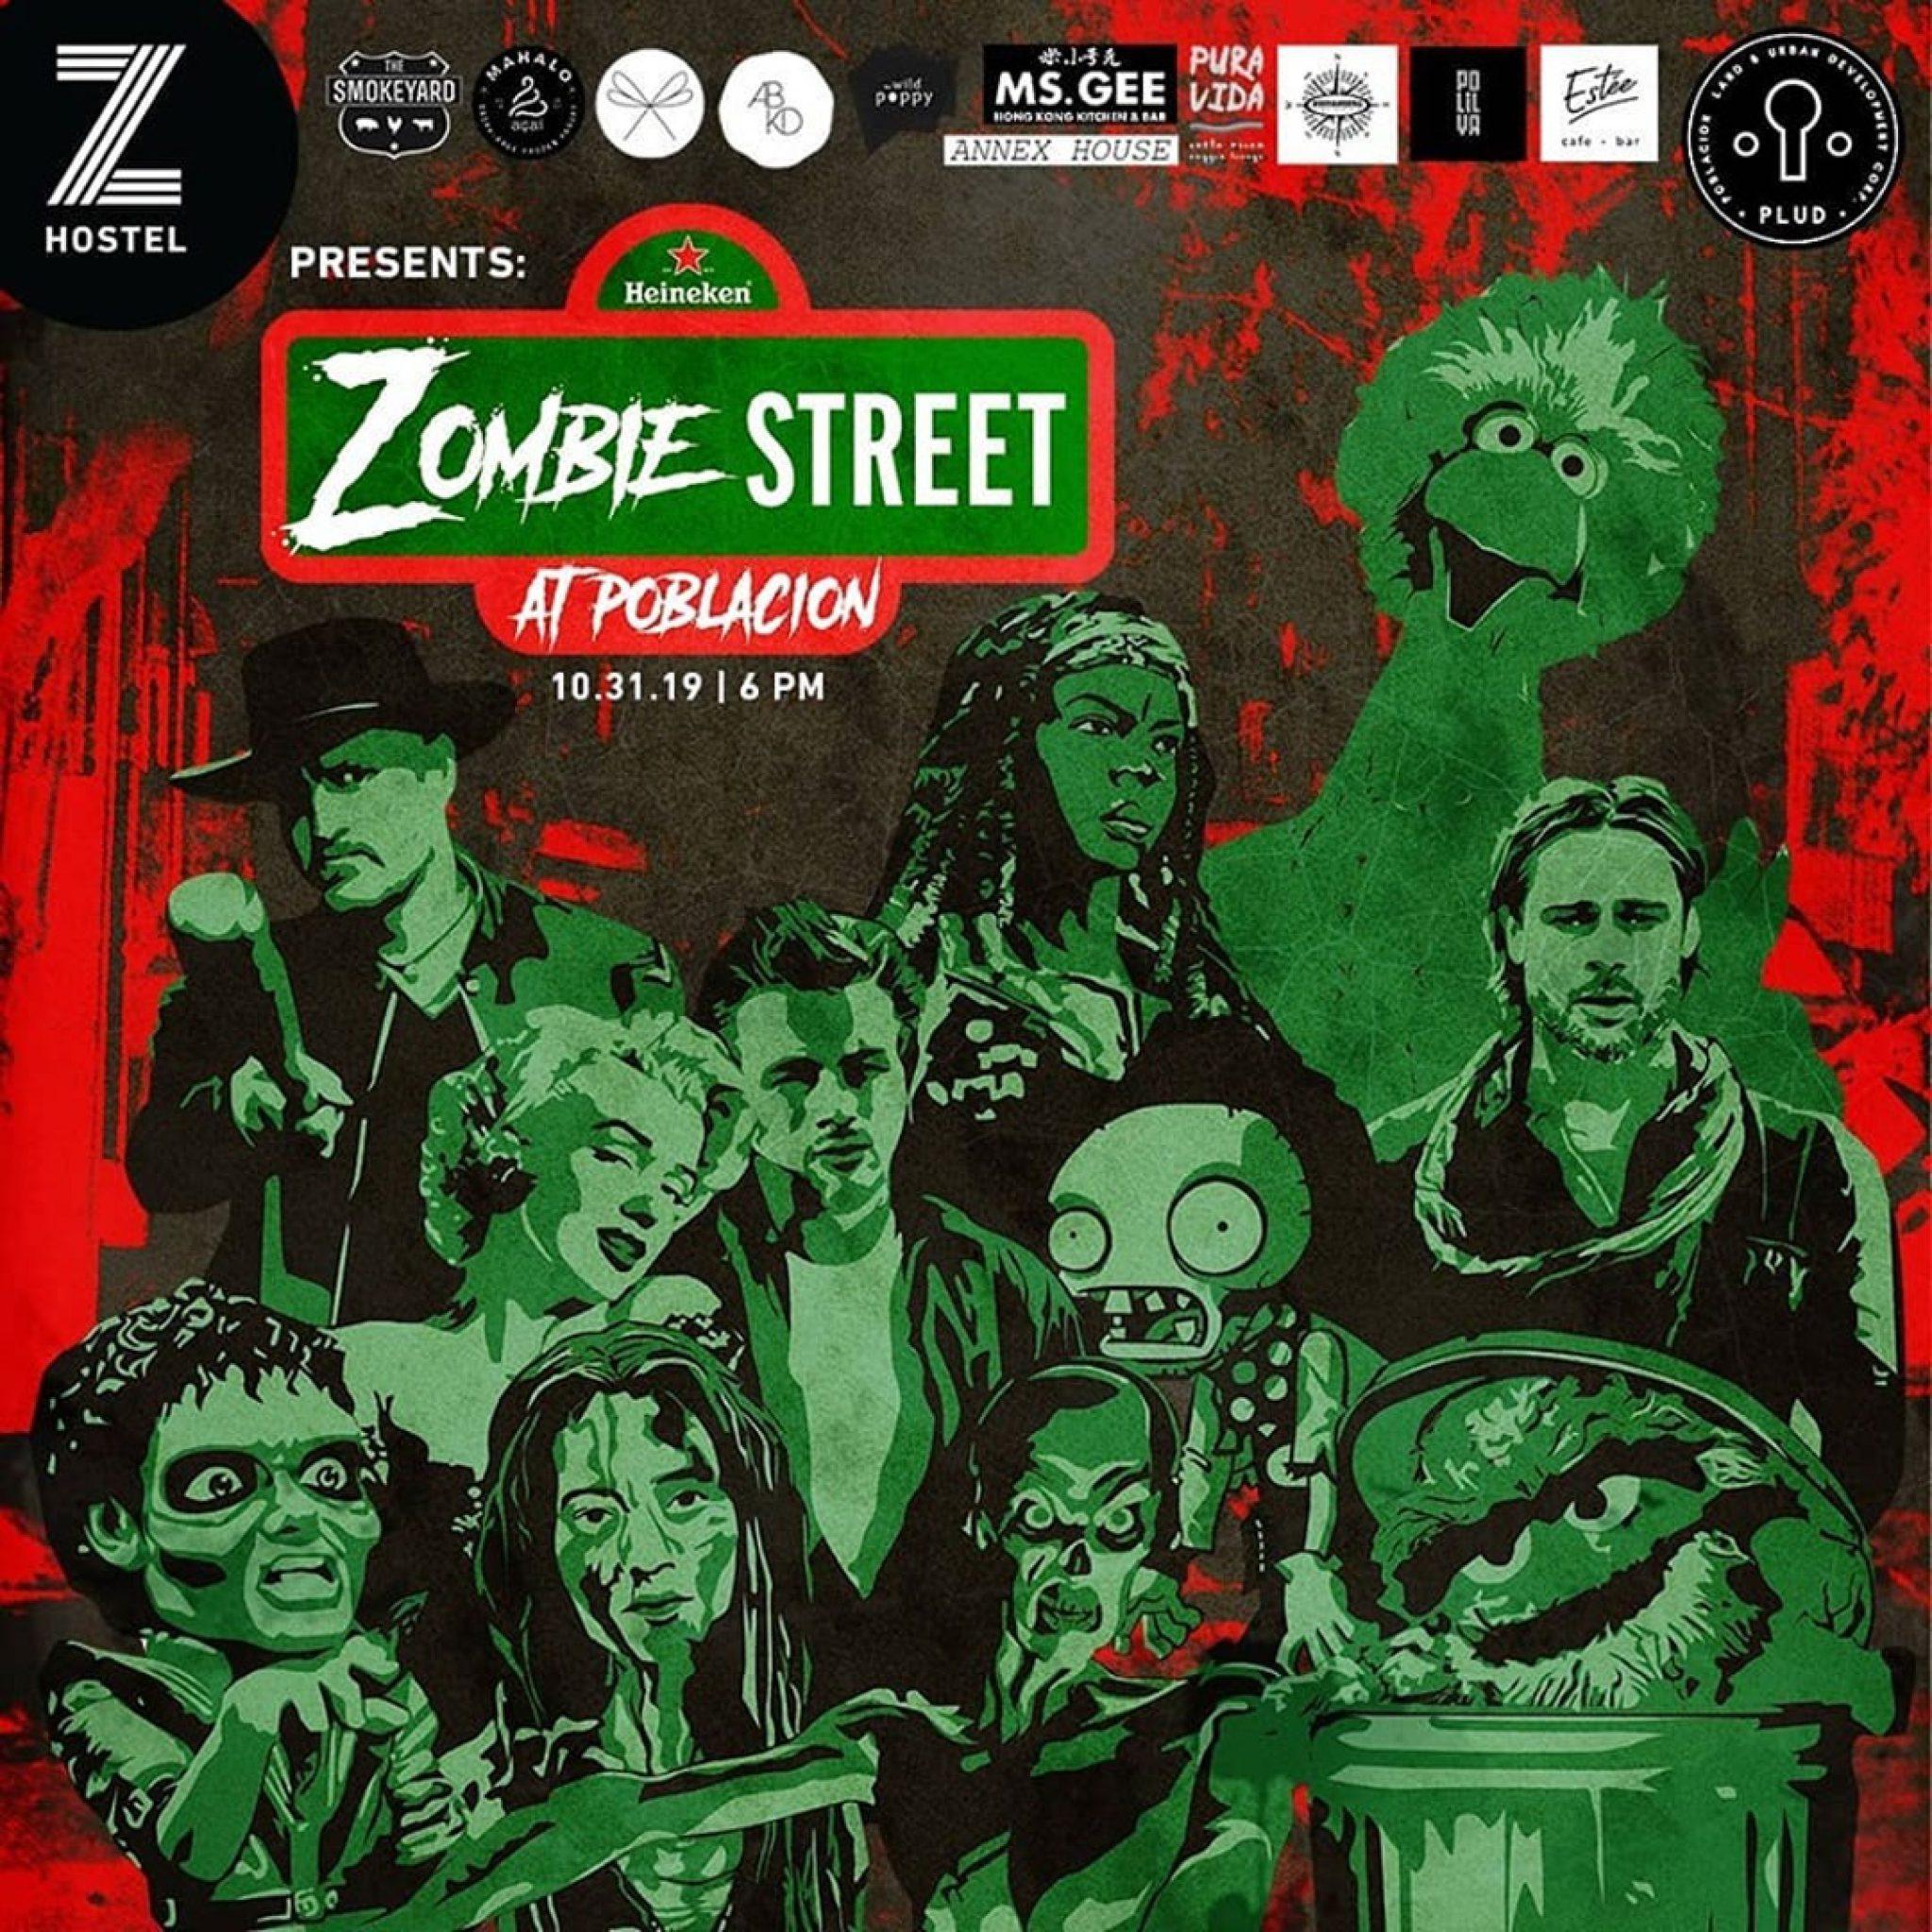 Zombie Street at Poblacion